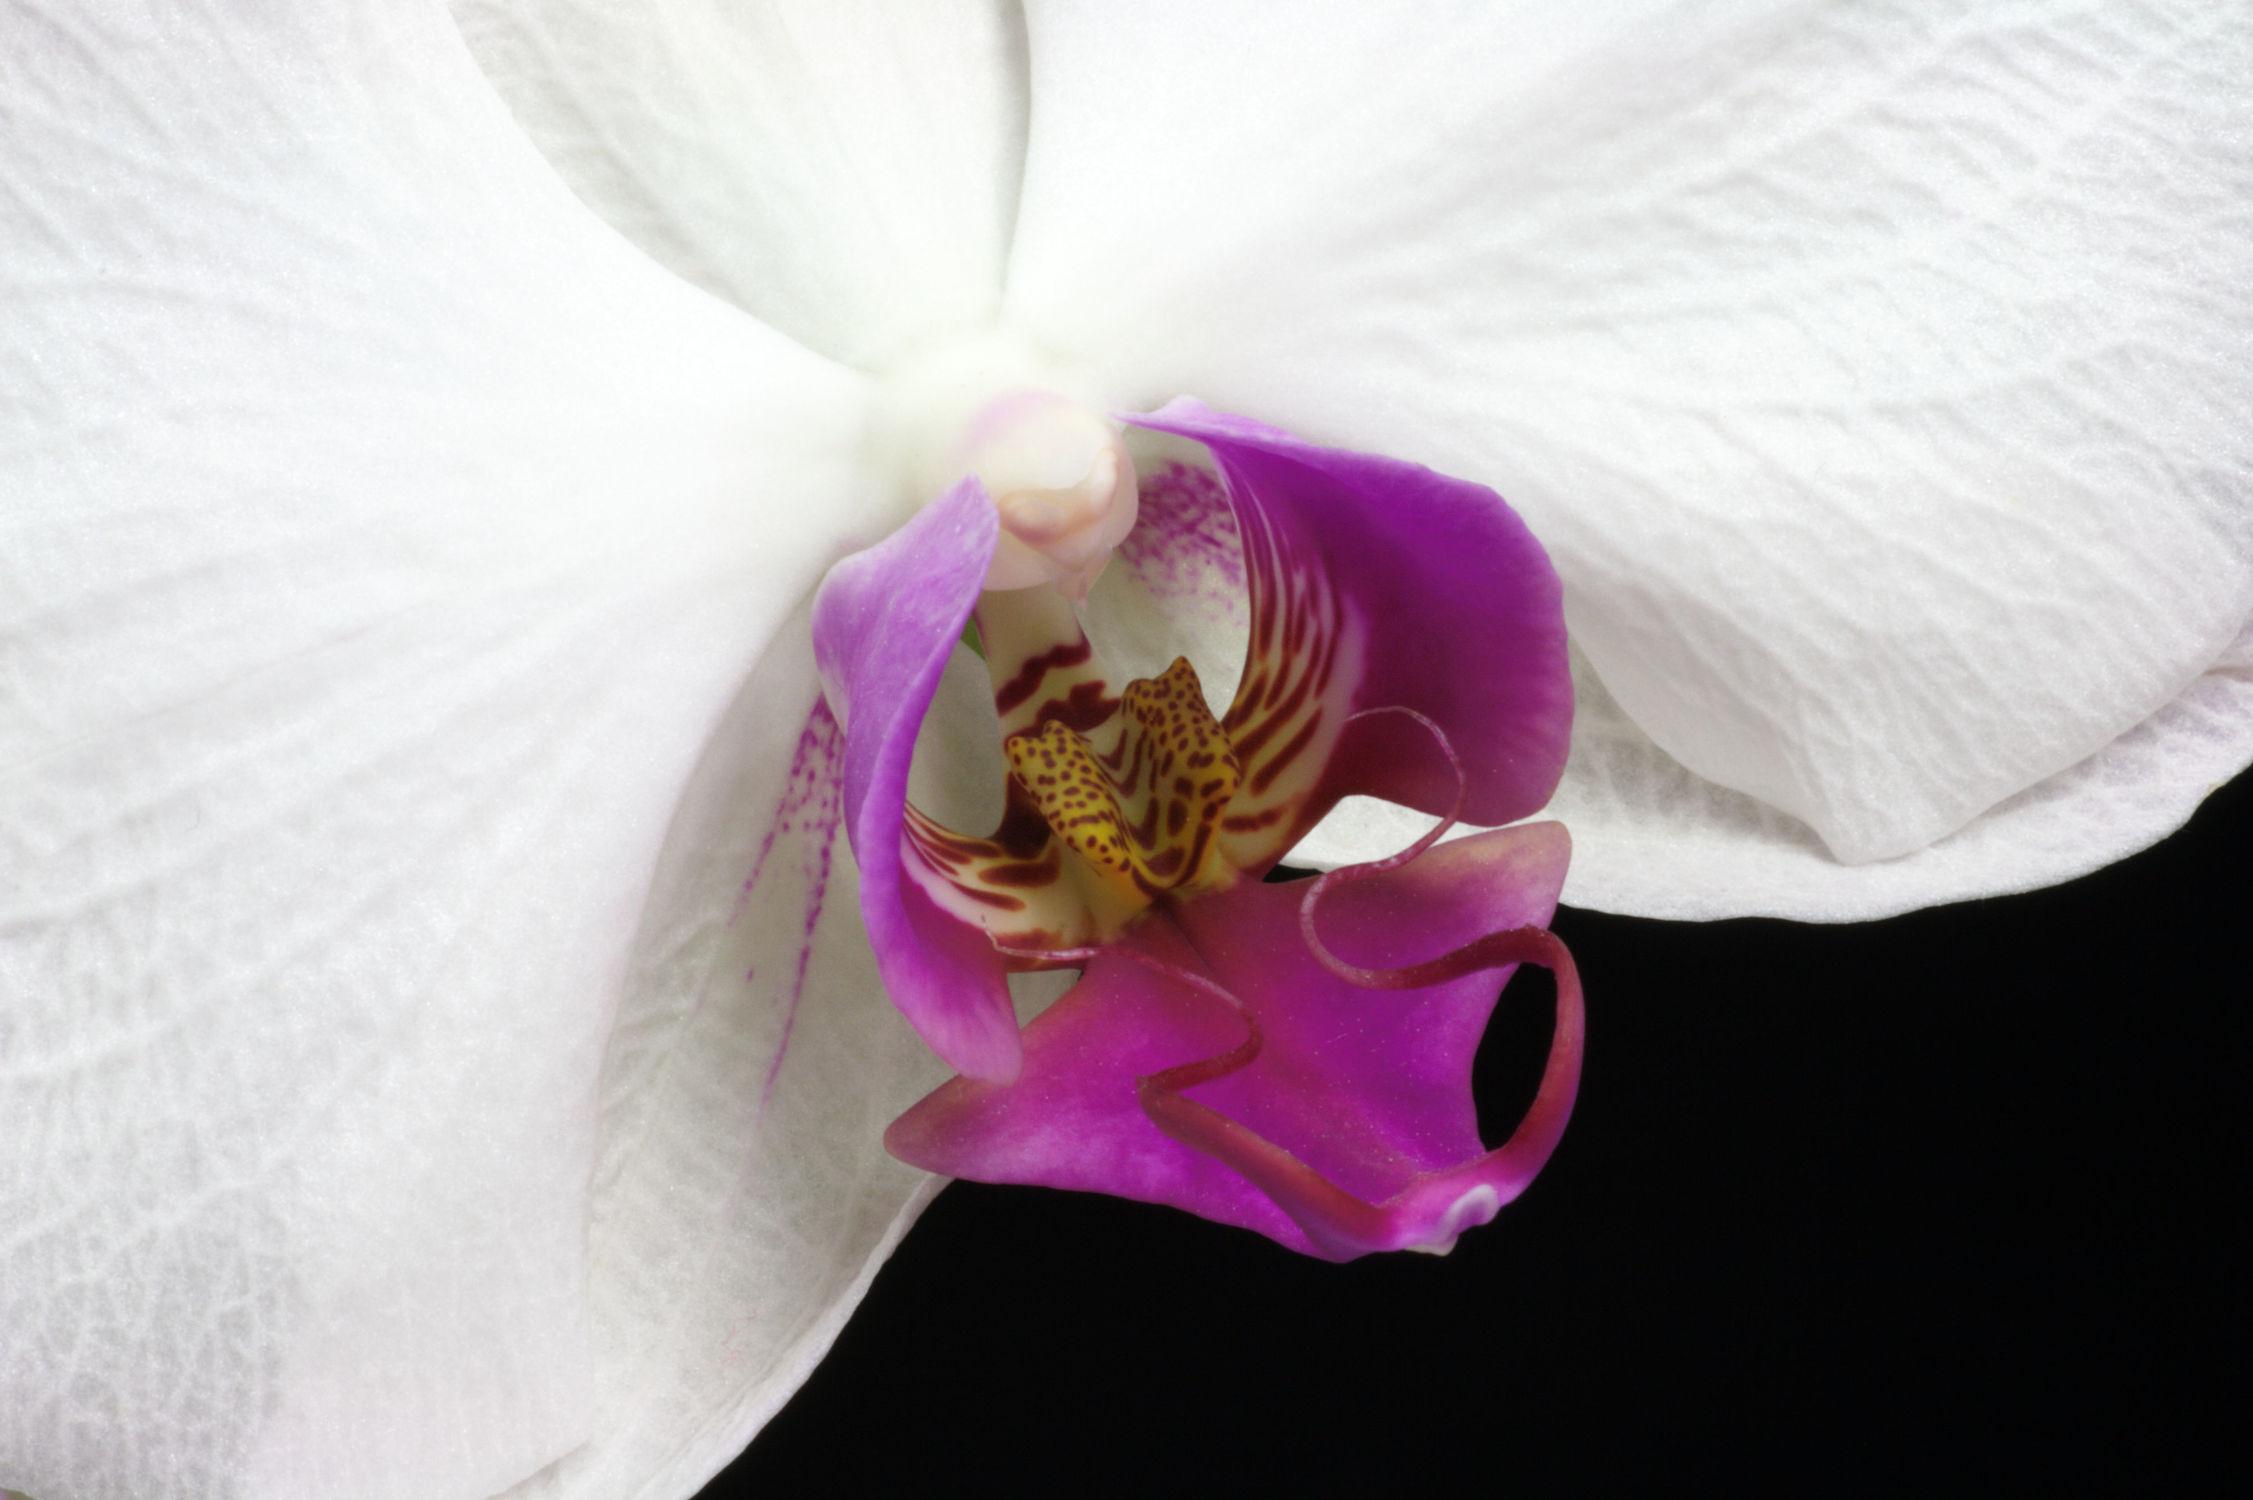 Bild mit Pflanzen, Blumen, Orchideen, Blume, Orchidee, Pflanze, Makro, Blüten, blüte